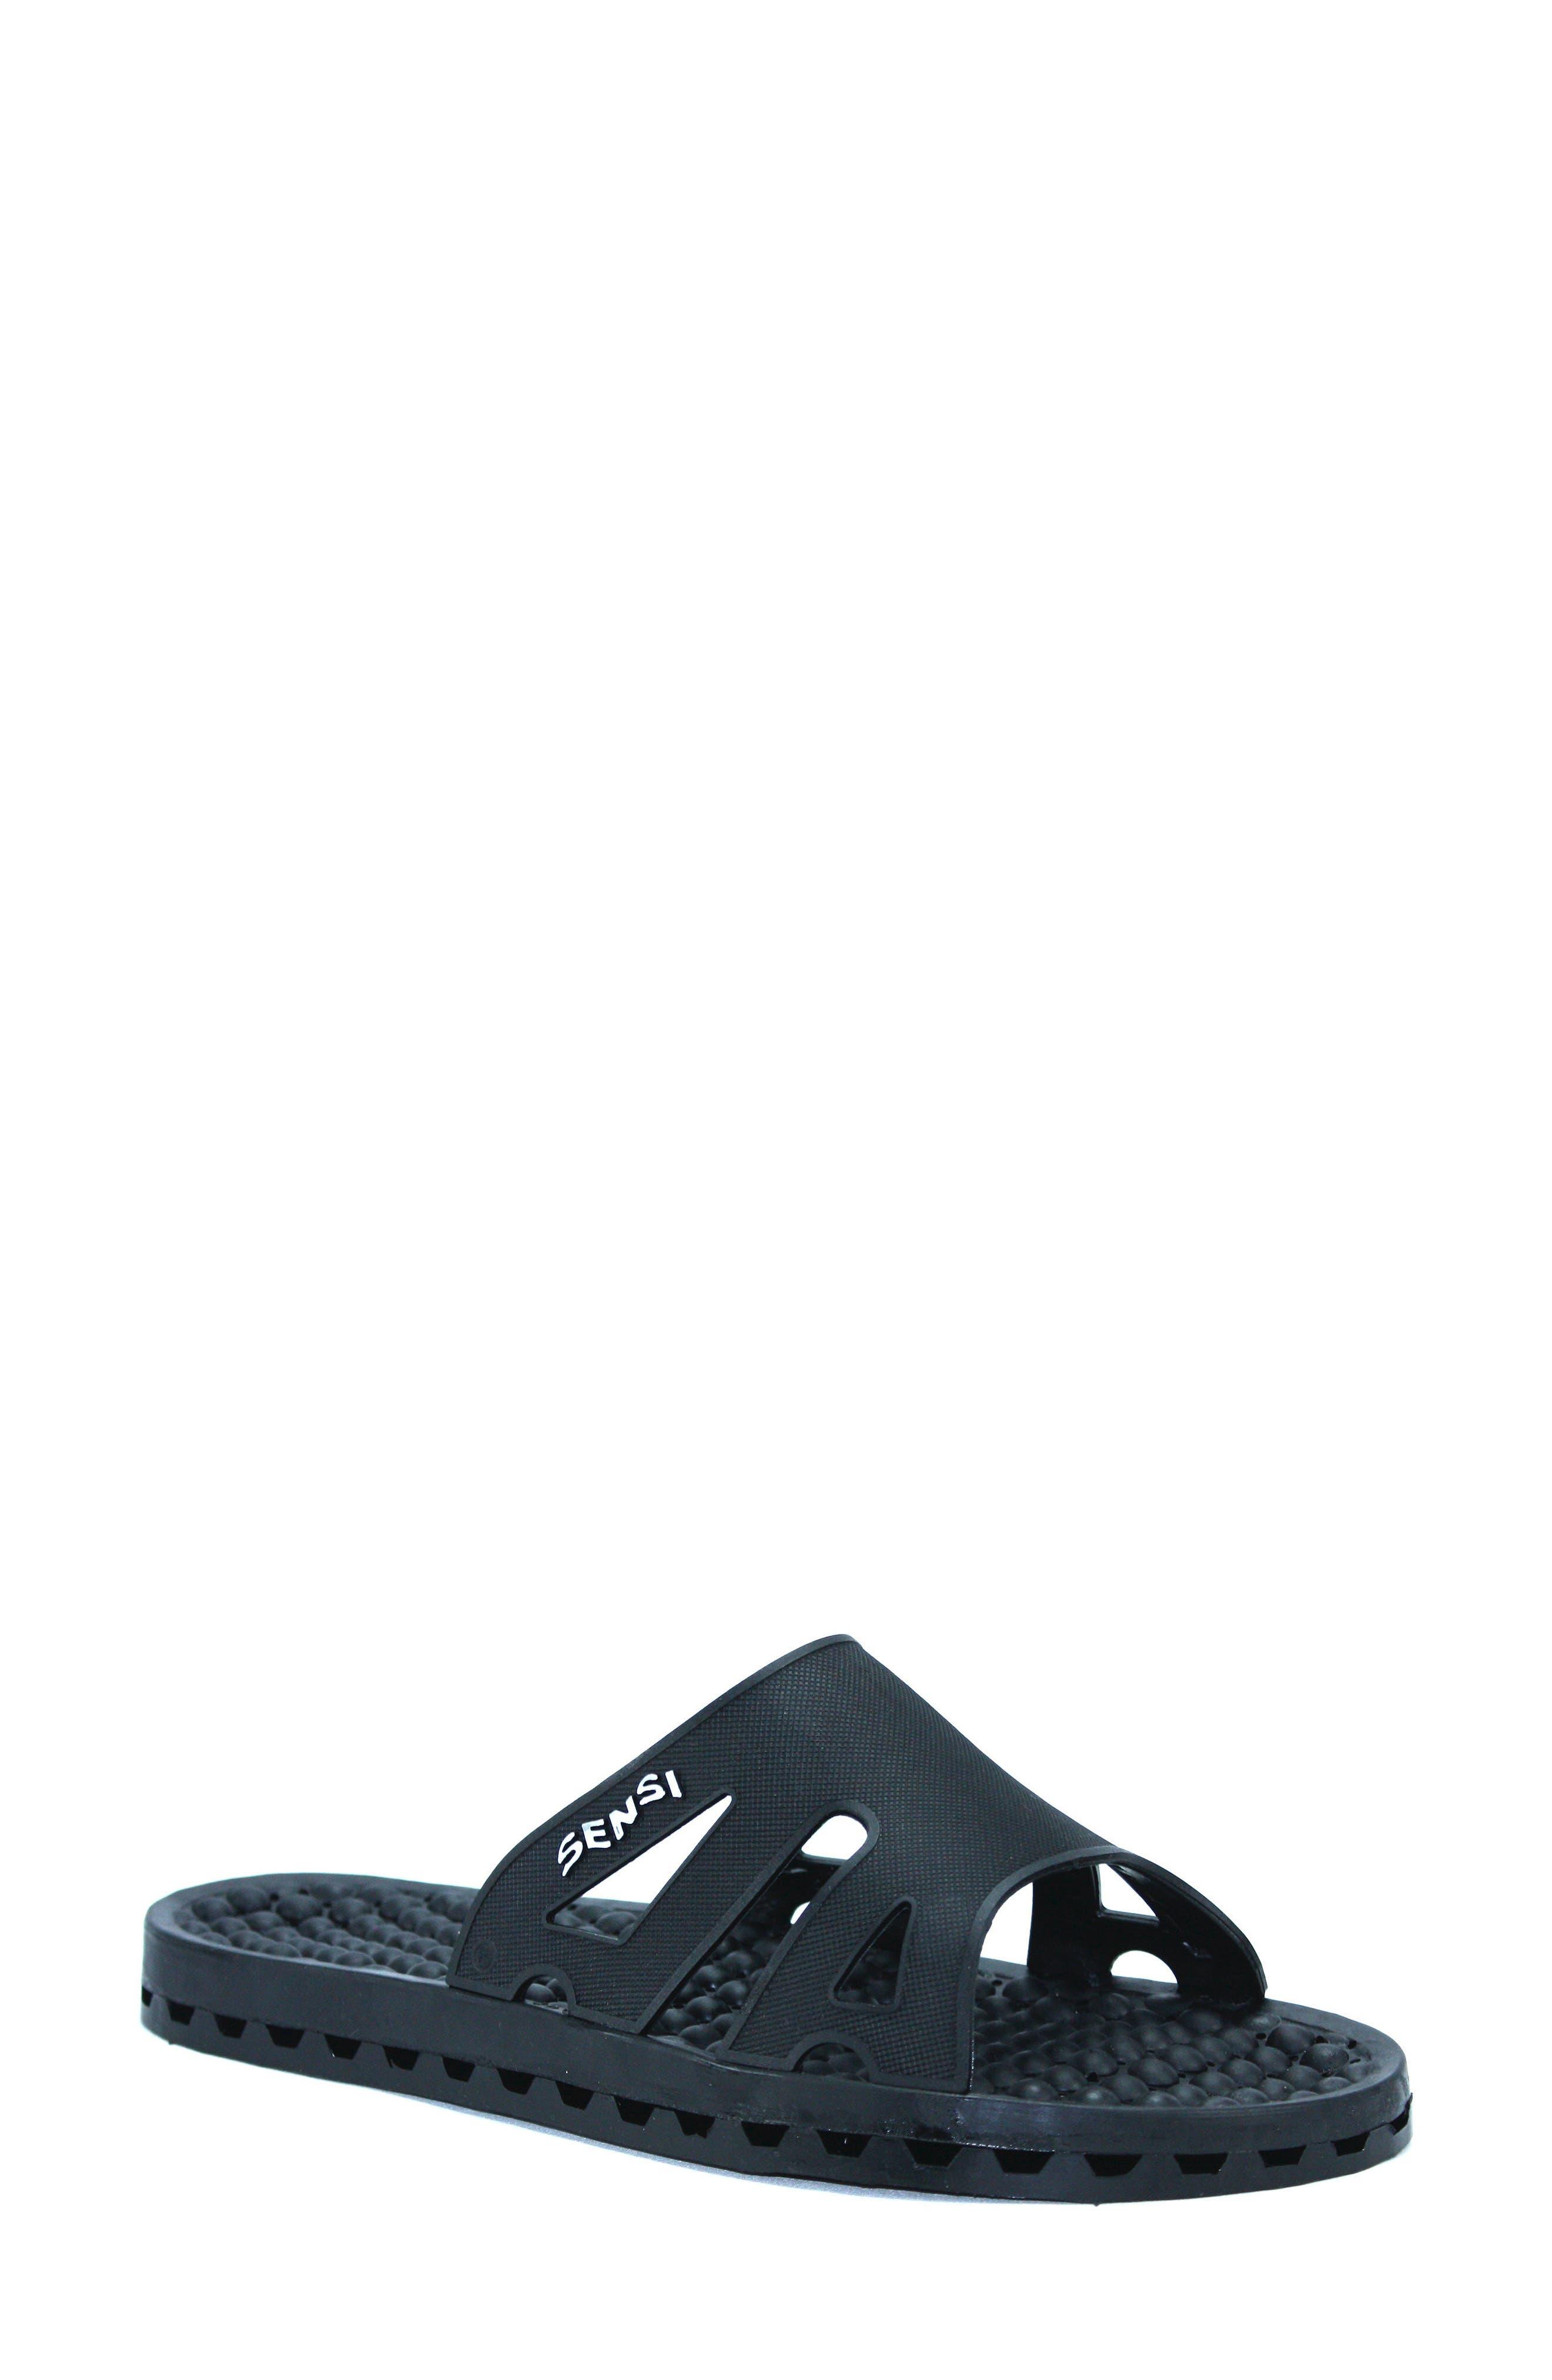 Regatta Ice Slide Sandal,                             Main thumbnail 1, color,                             SOLID BLACK